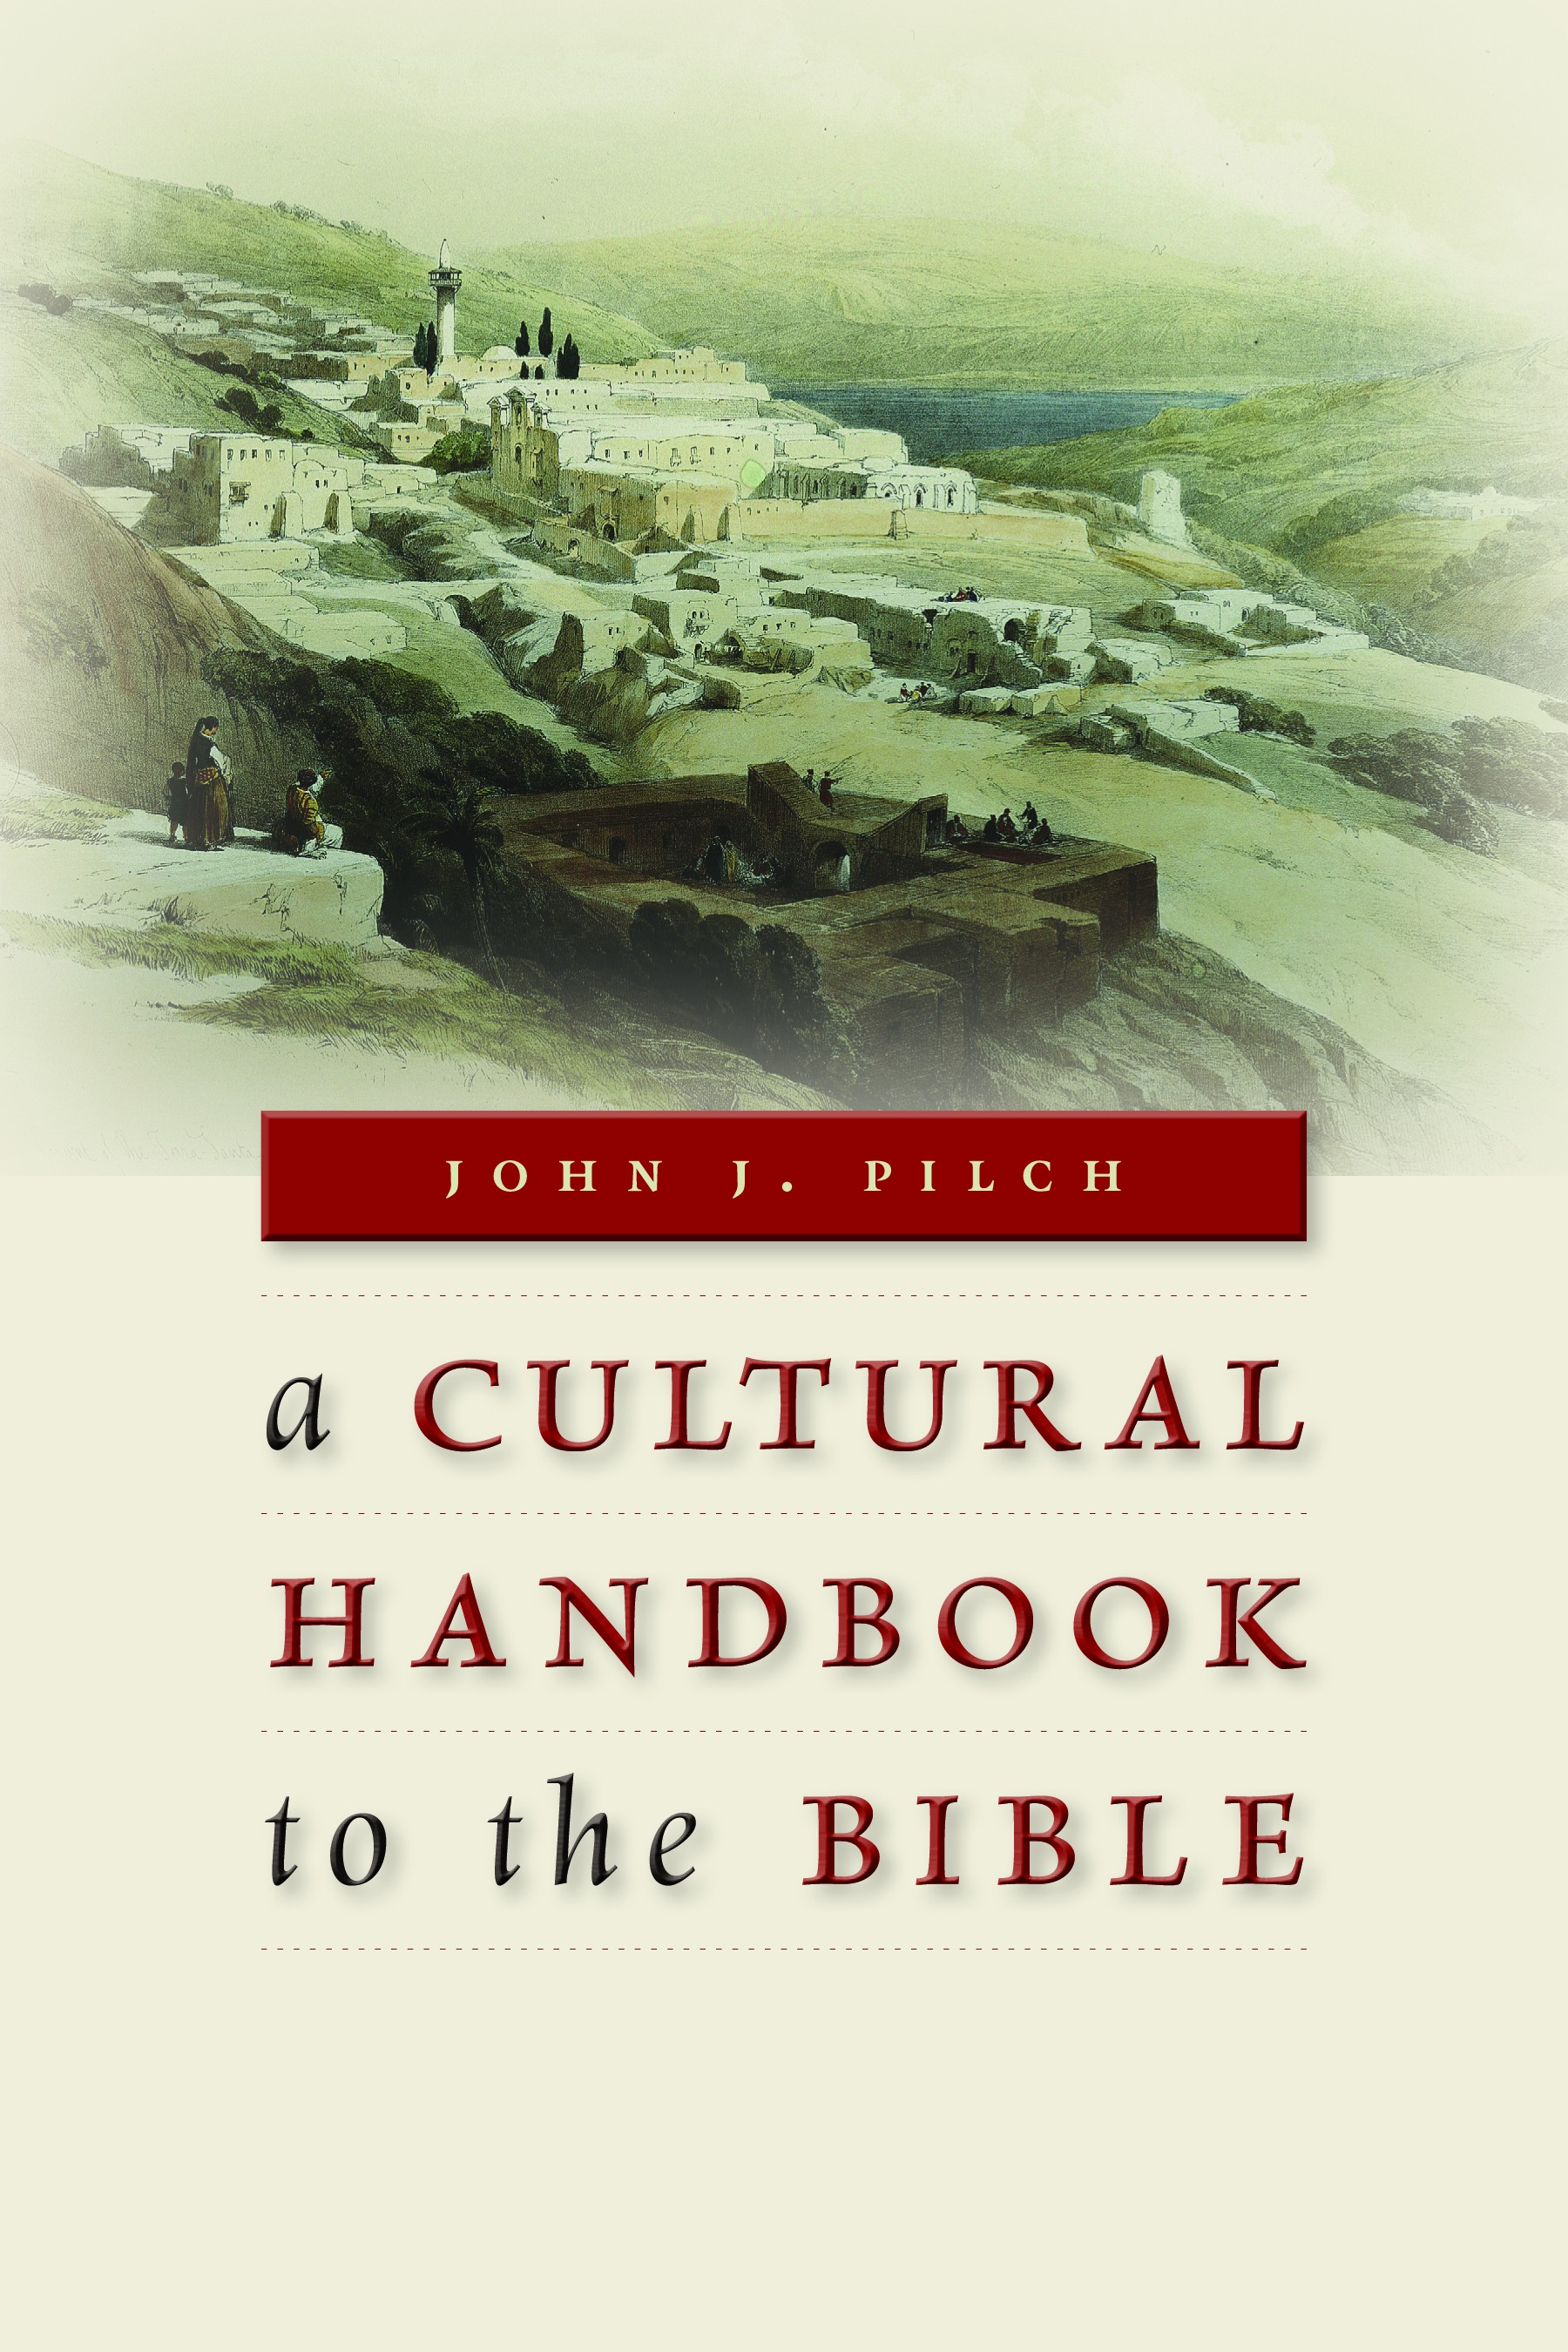 A cultural handbook to the bible john j pilch eerdmans fandeluxe Gallery